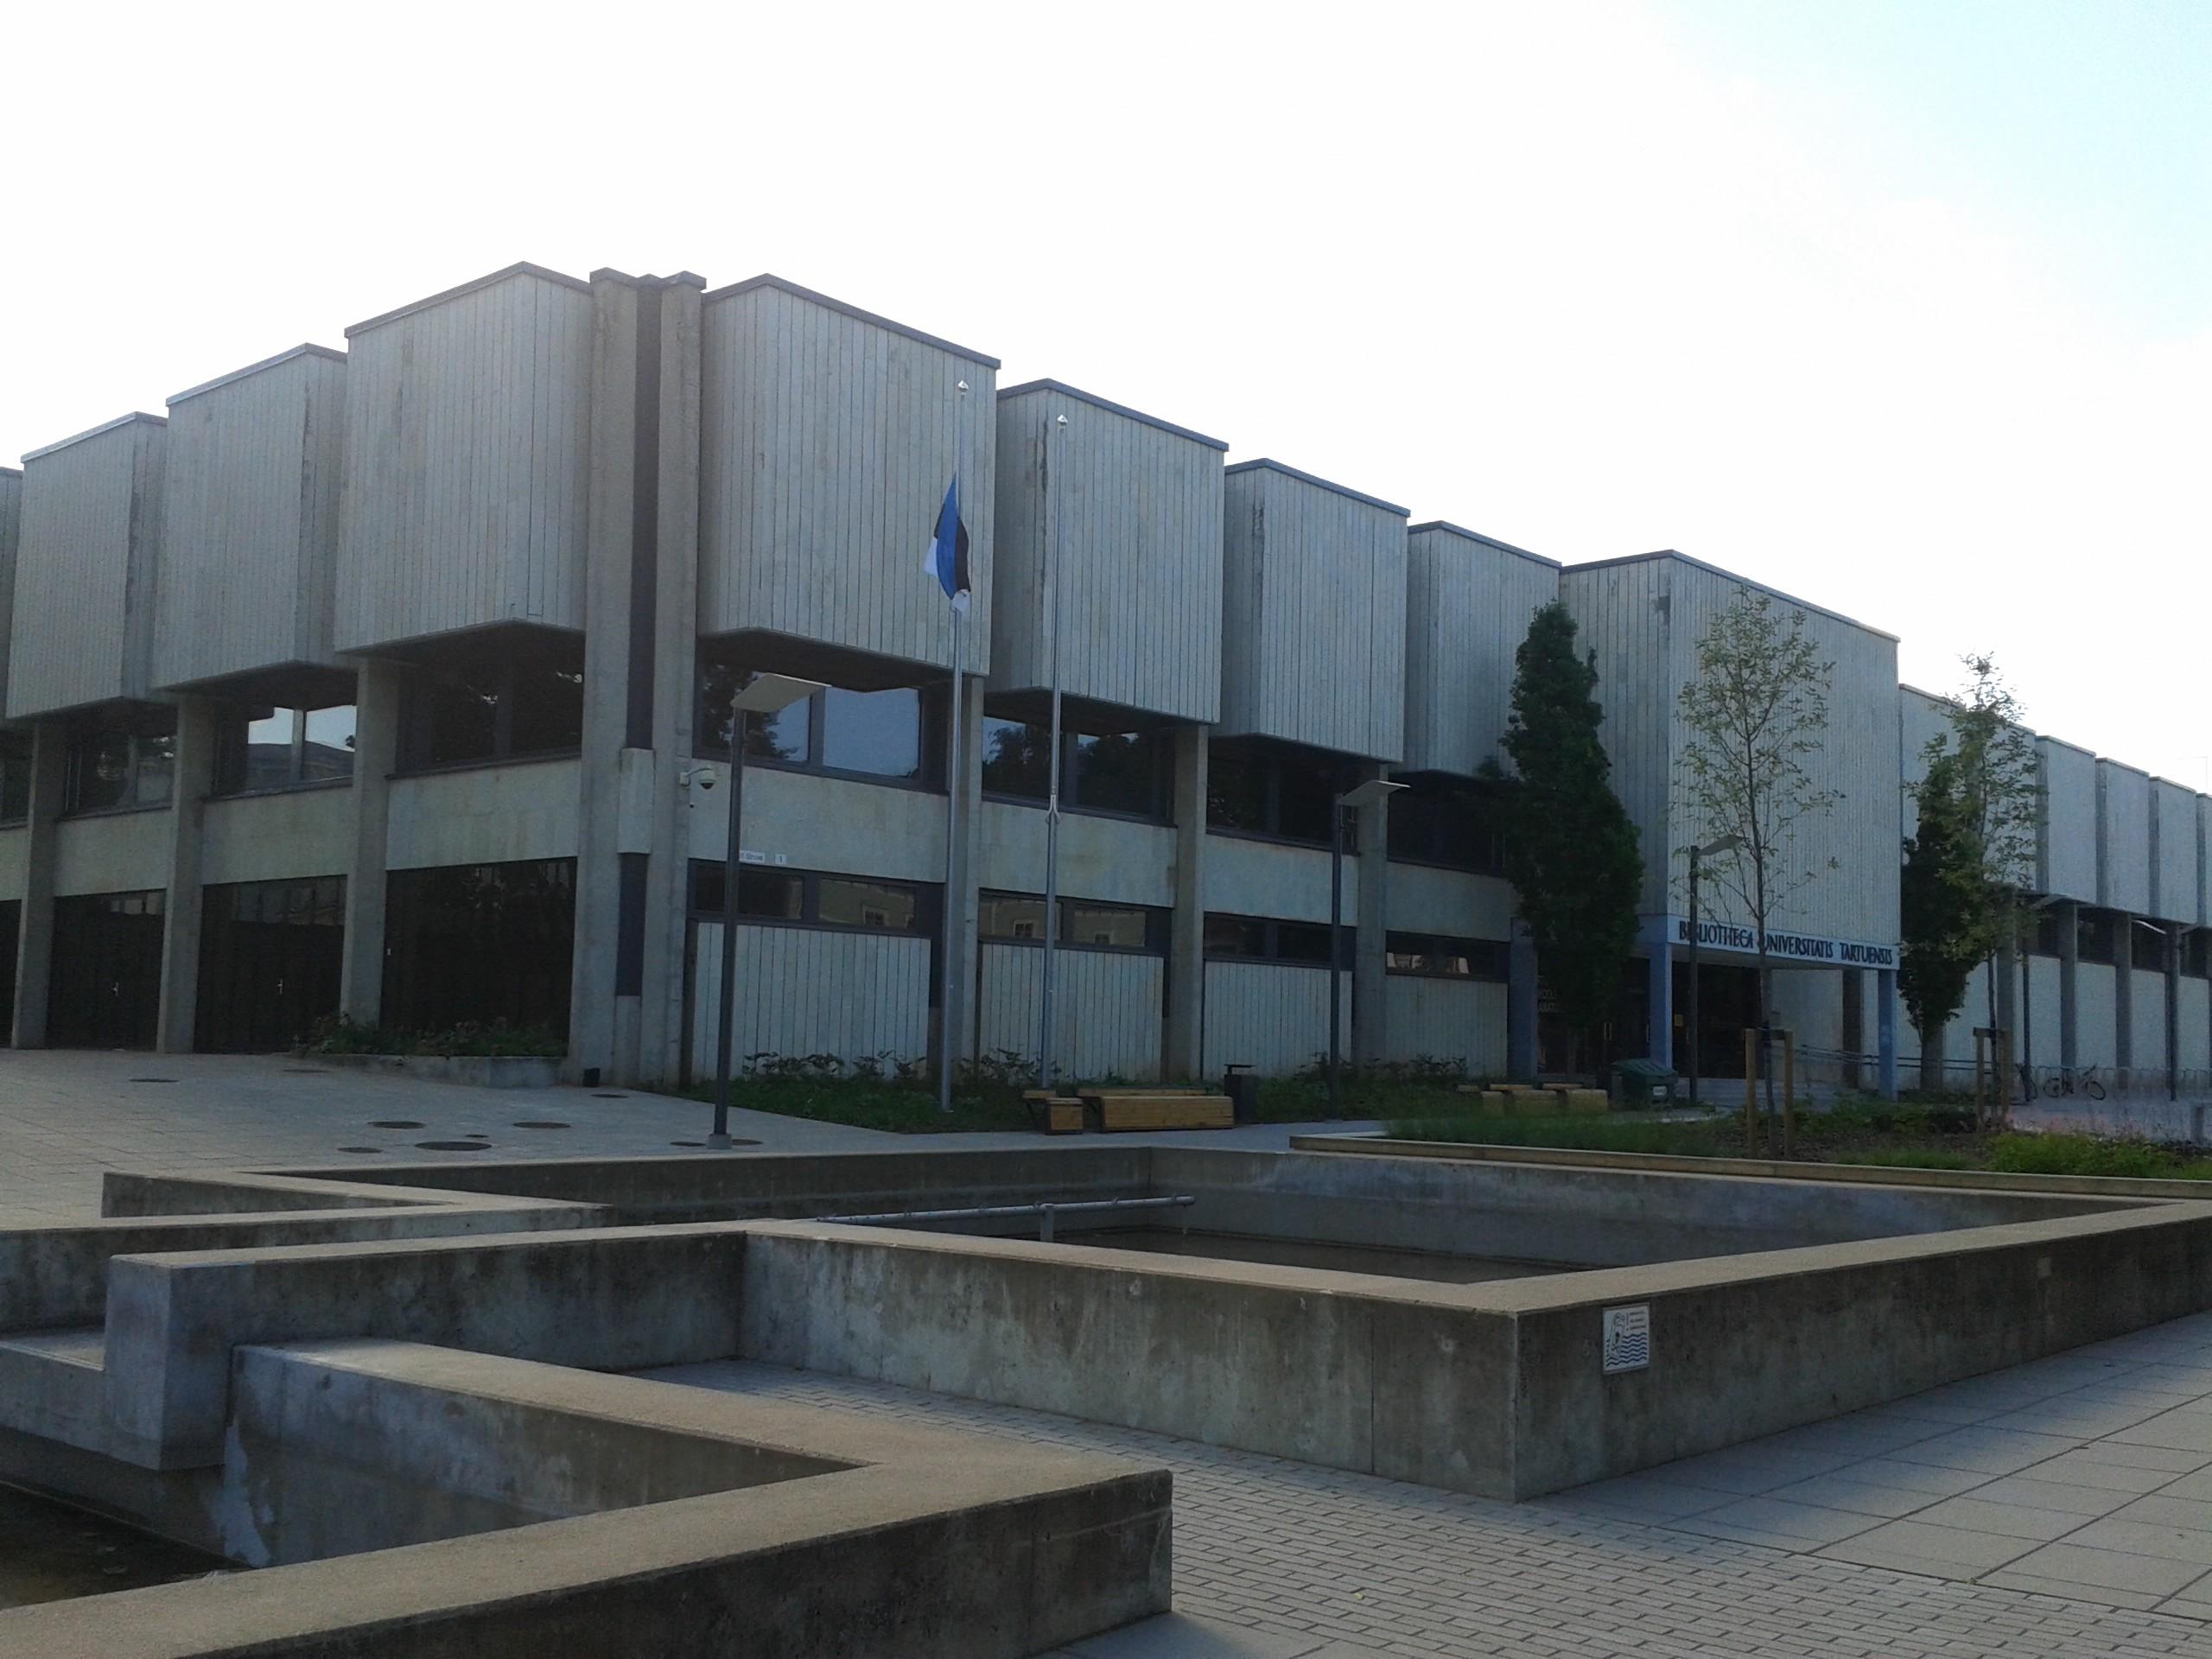 The Tartu University Library main building in 2017.